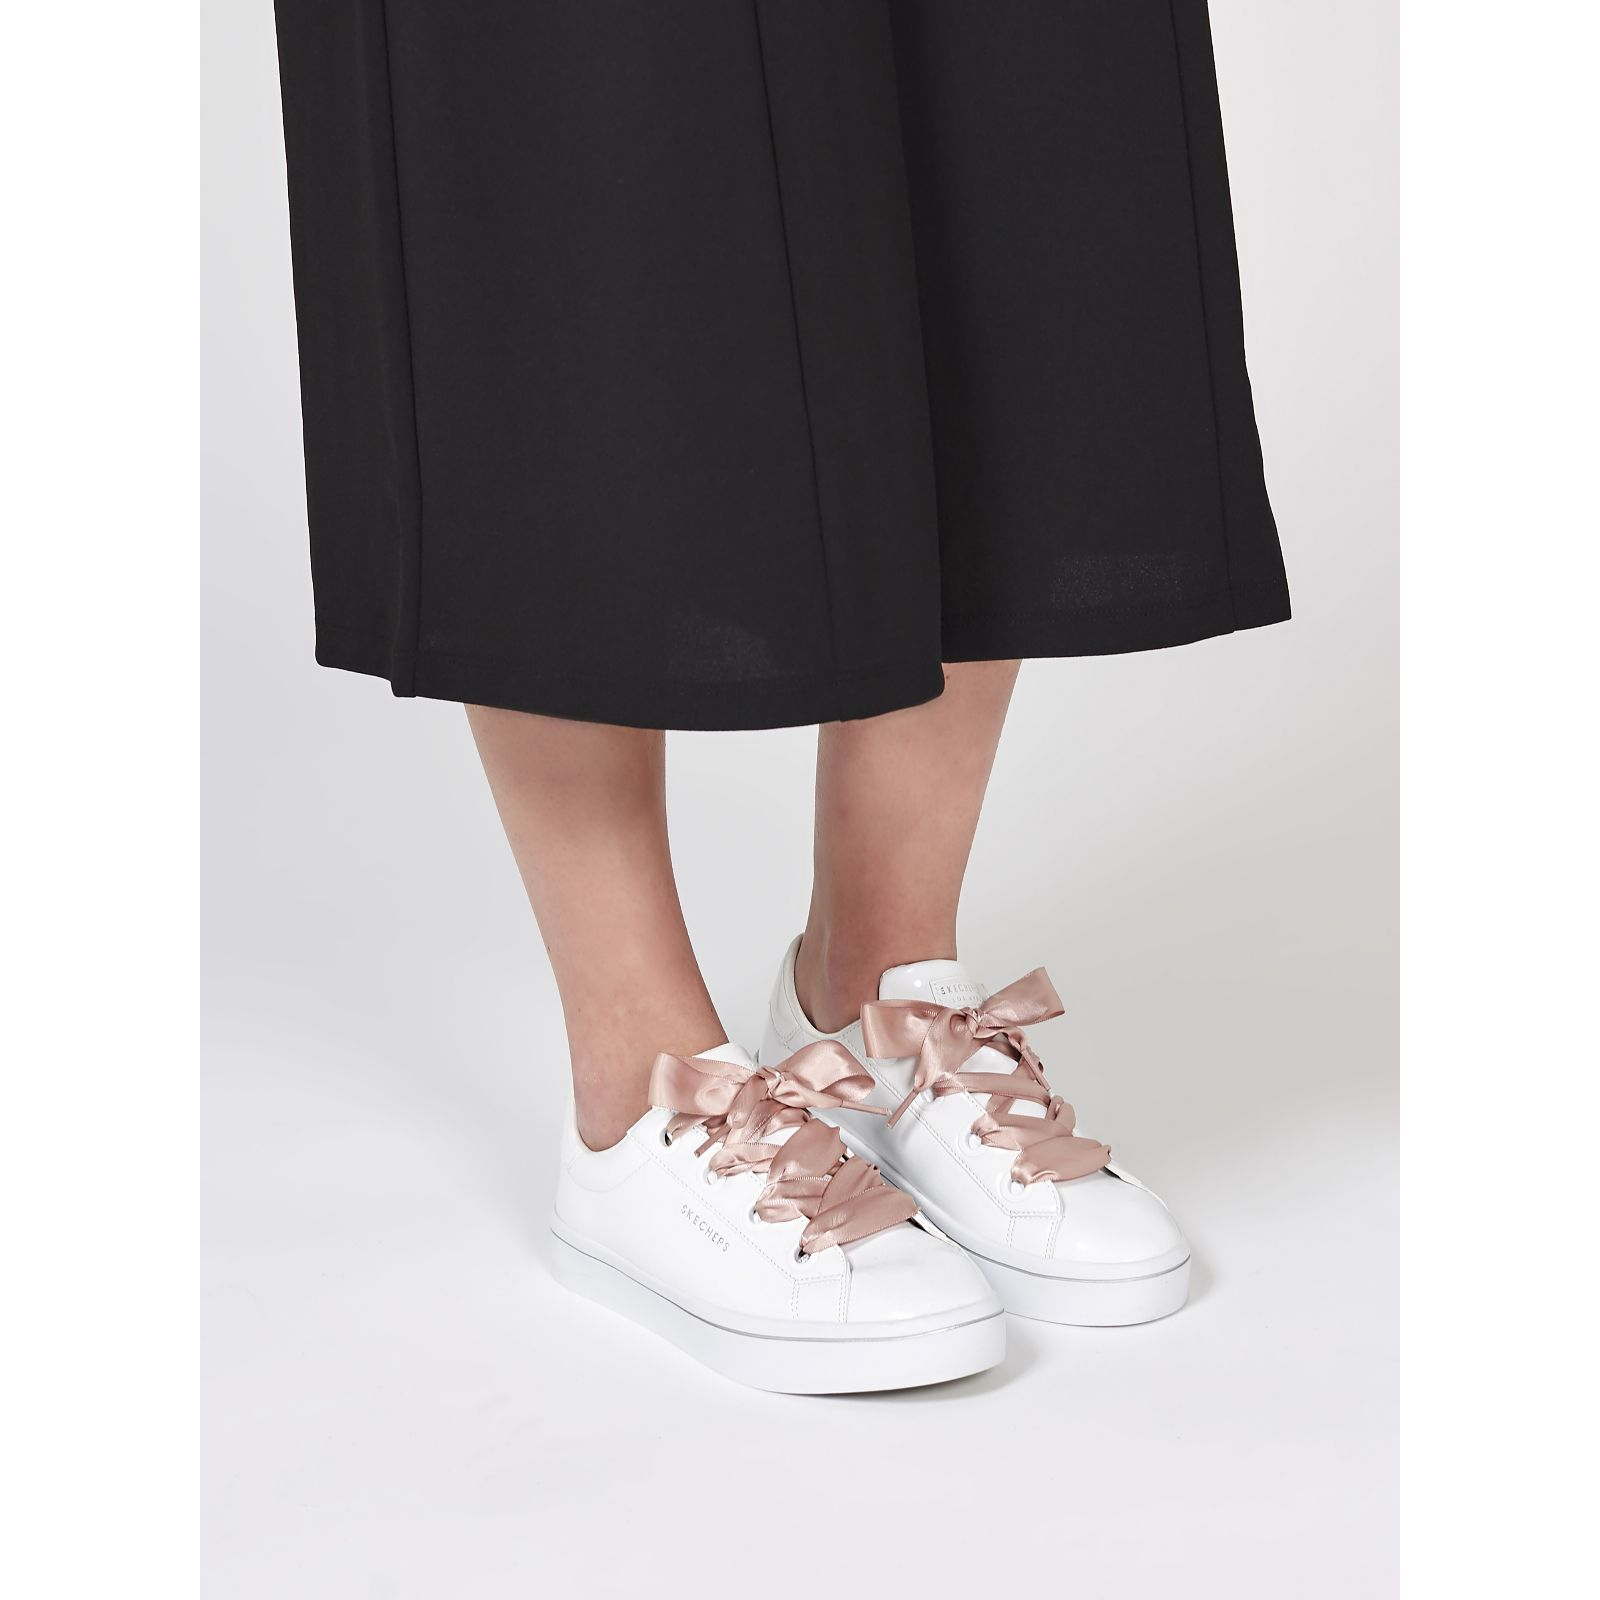 Skechers Hi Lite Patent Fat Lace Sneaker QVC UK